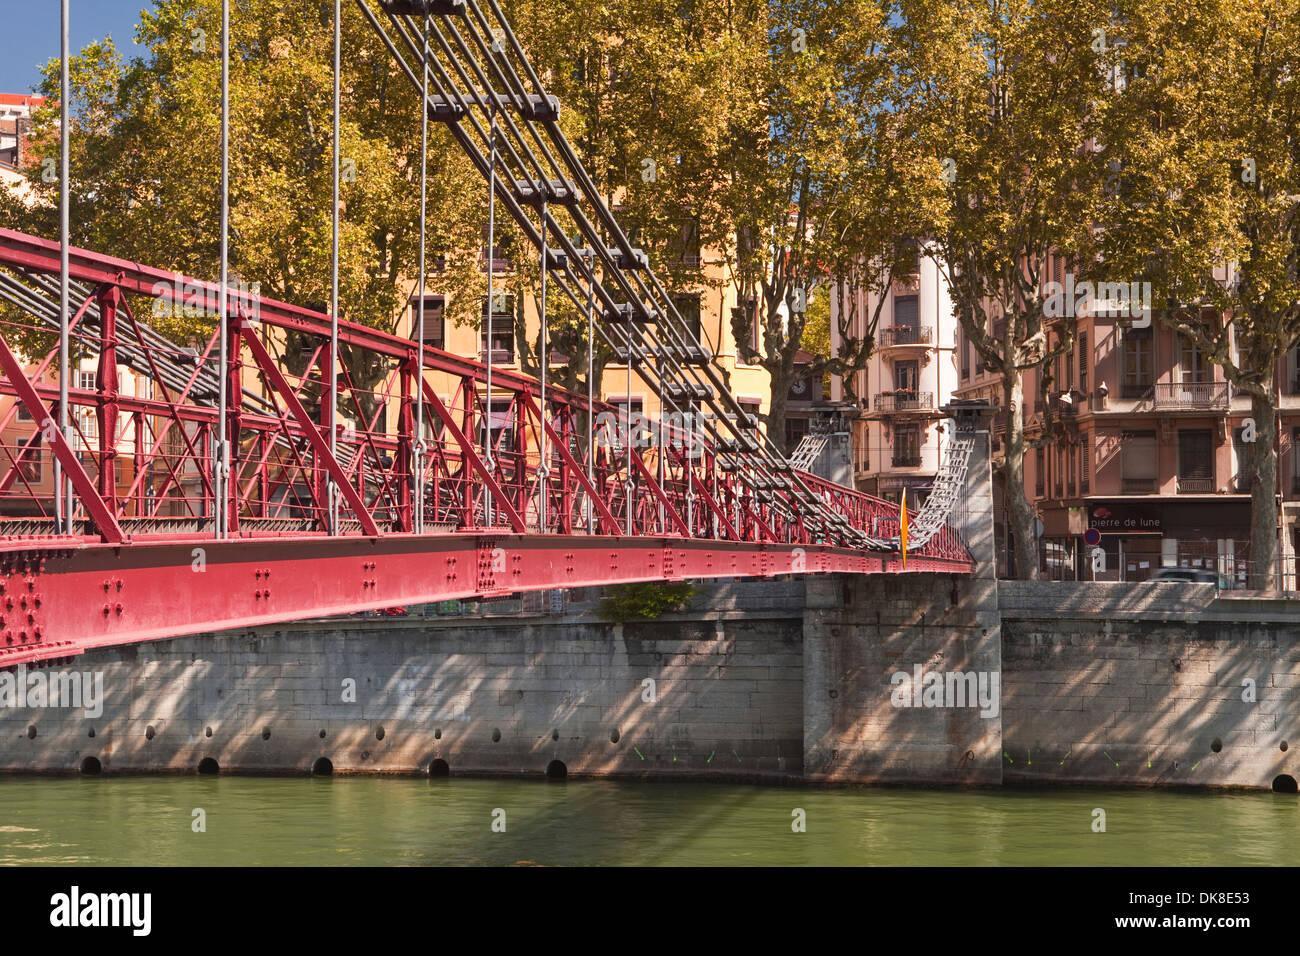 Passerelle Saint Vincent in the city of Lyon. - Stock Image